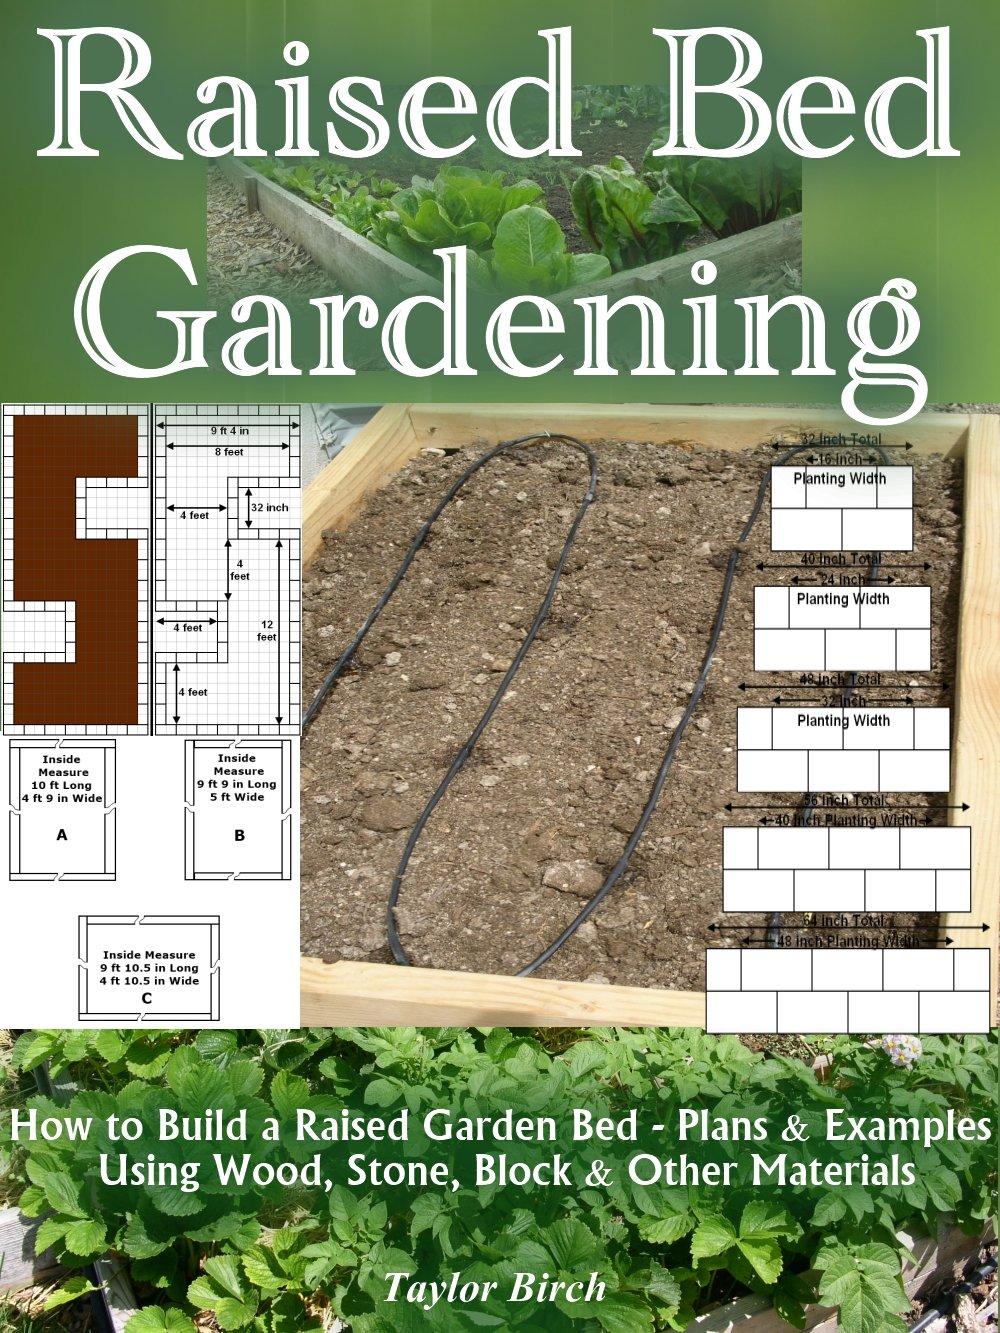 Raised Bed Vegetable Garden Design images